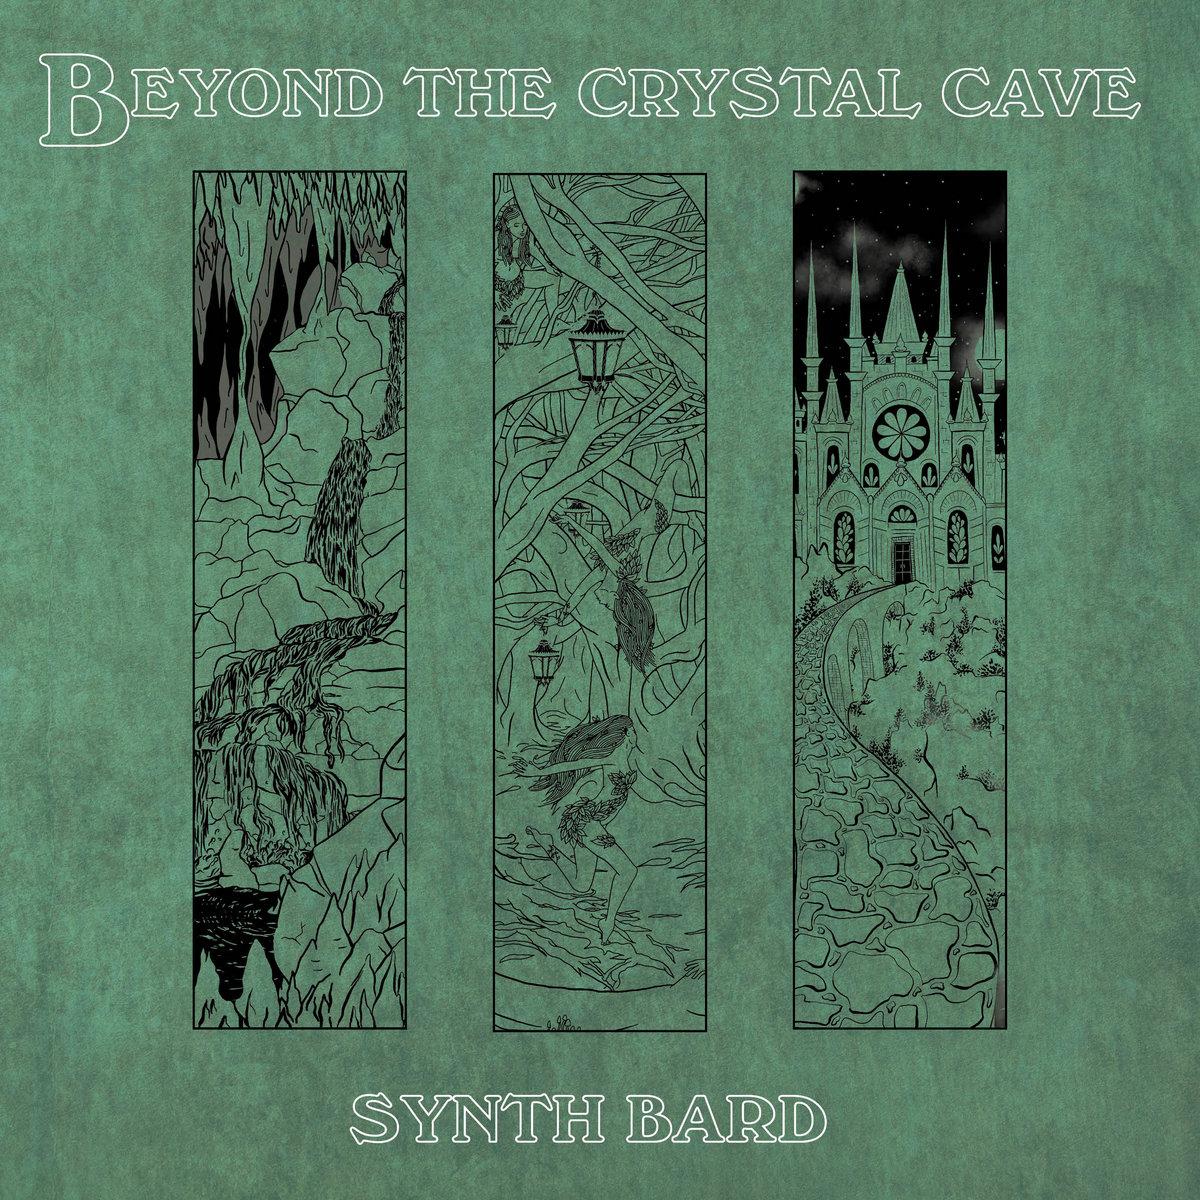 Synth Bard